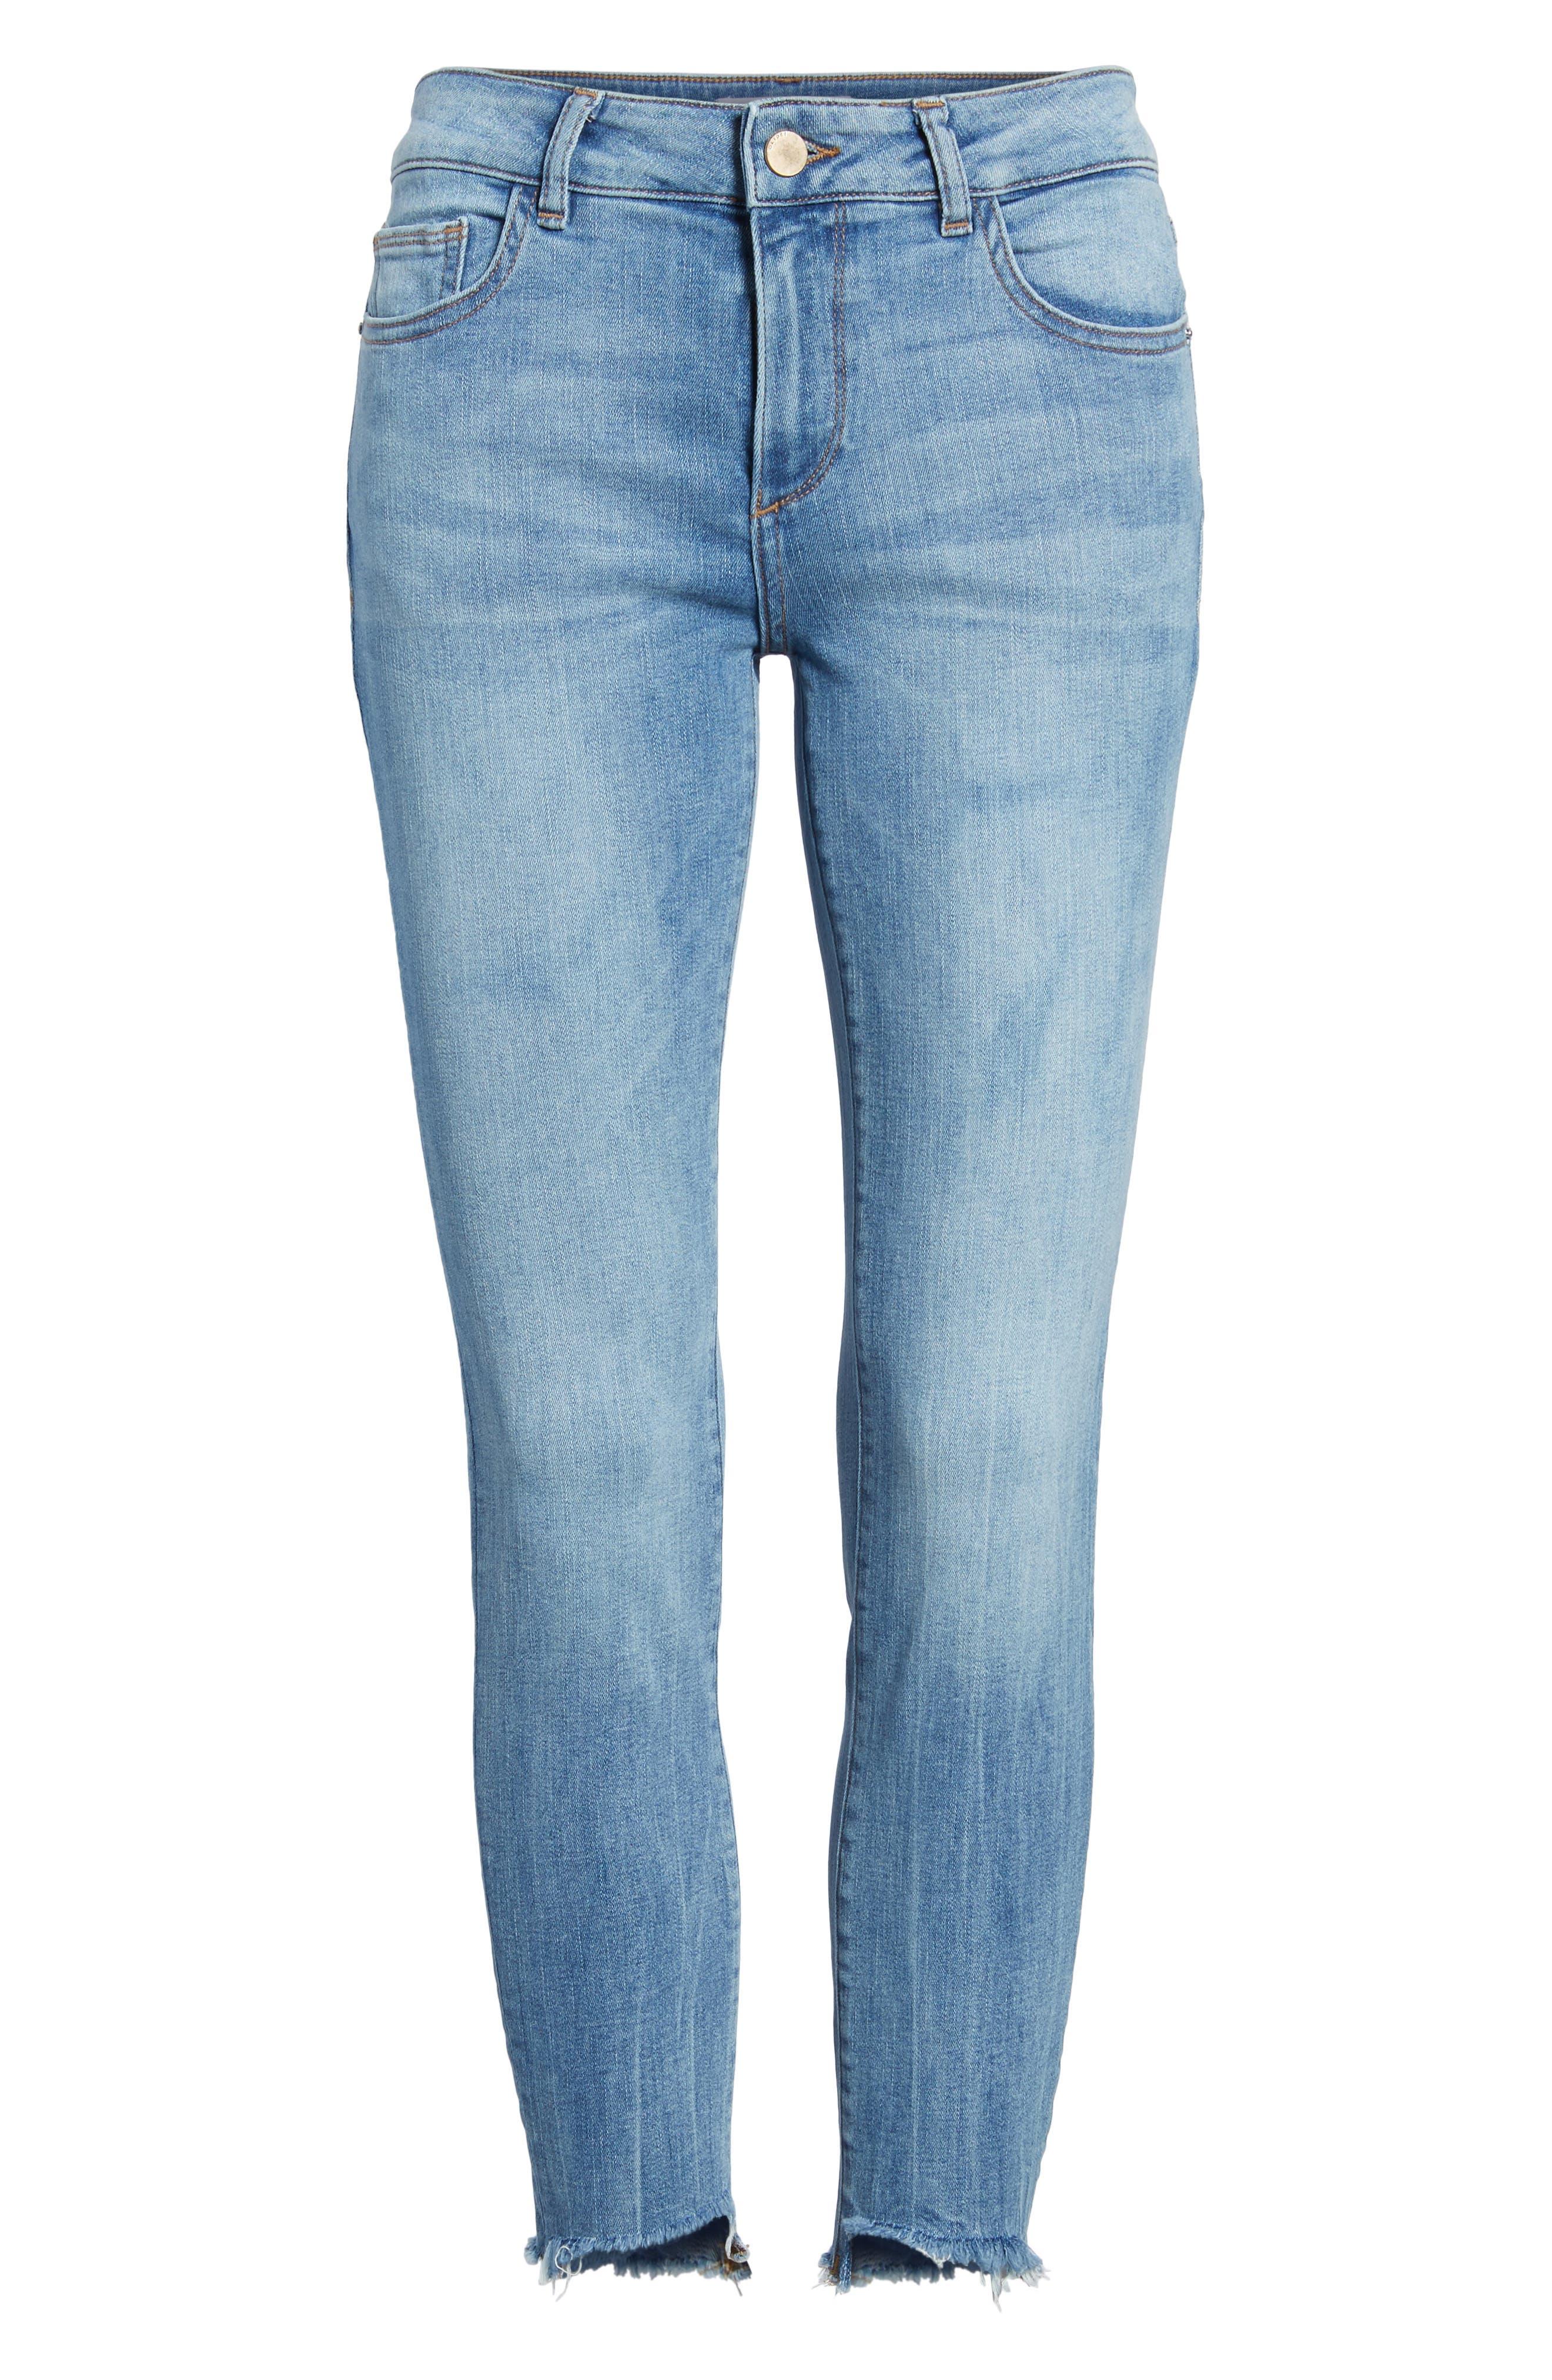 Florence Instasculpt Crop Skinny Jeans,                             Alternate thumbnail 7, color,                             429